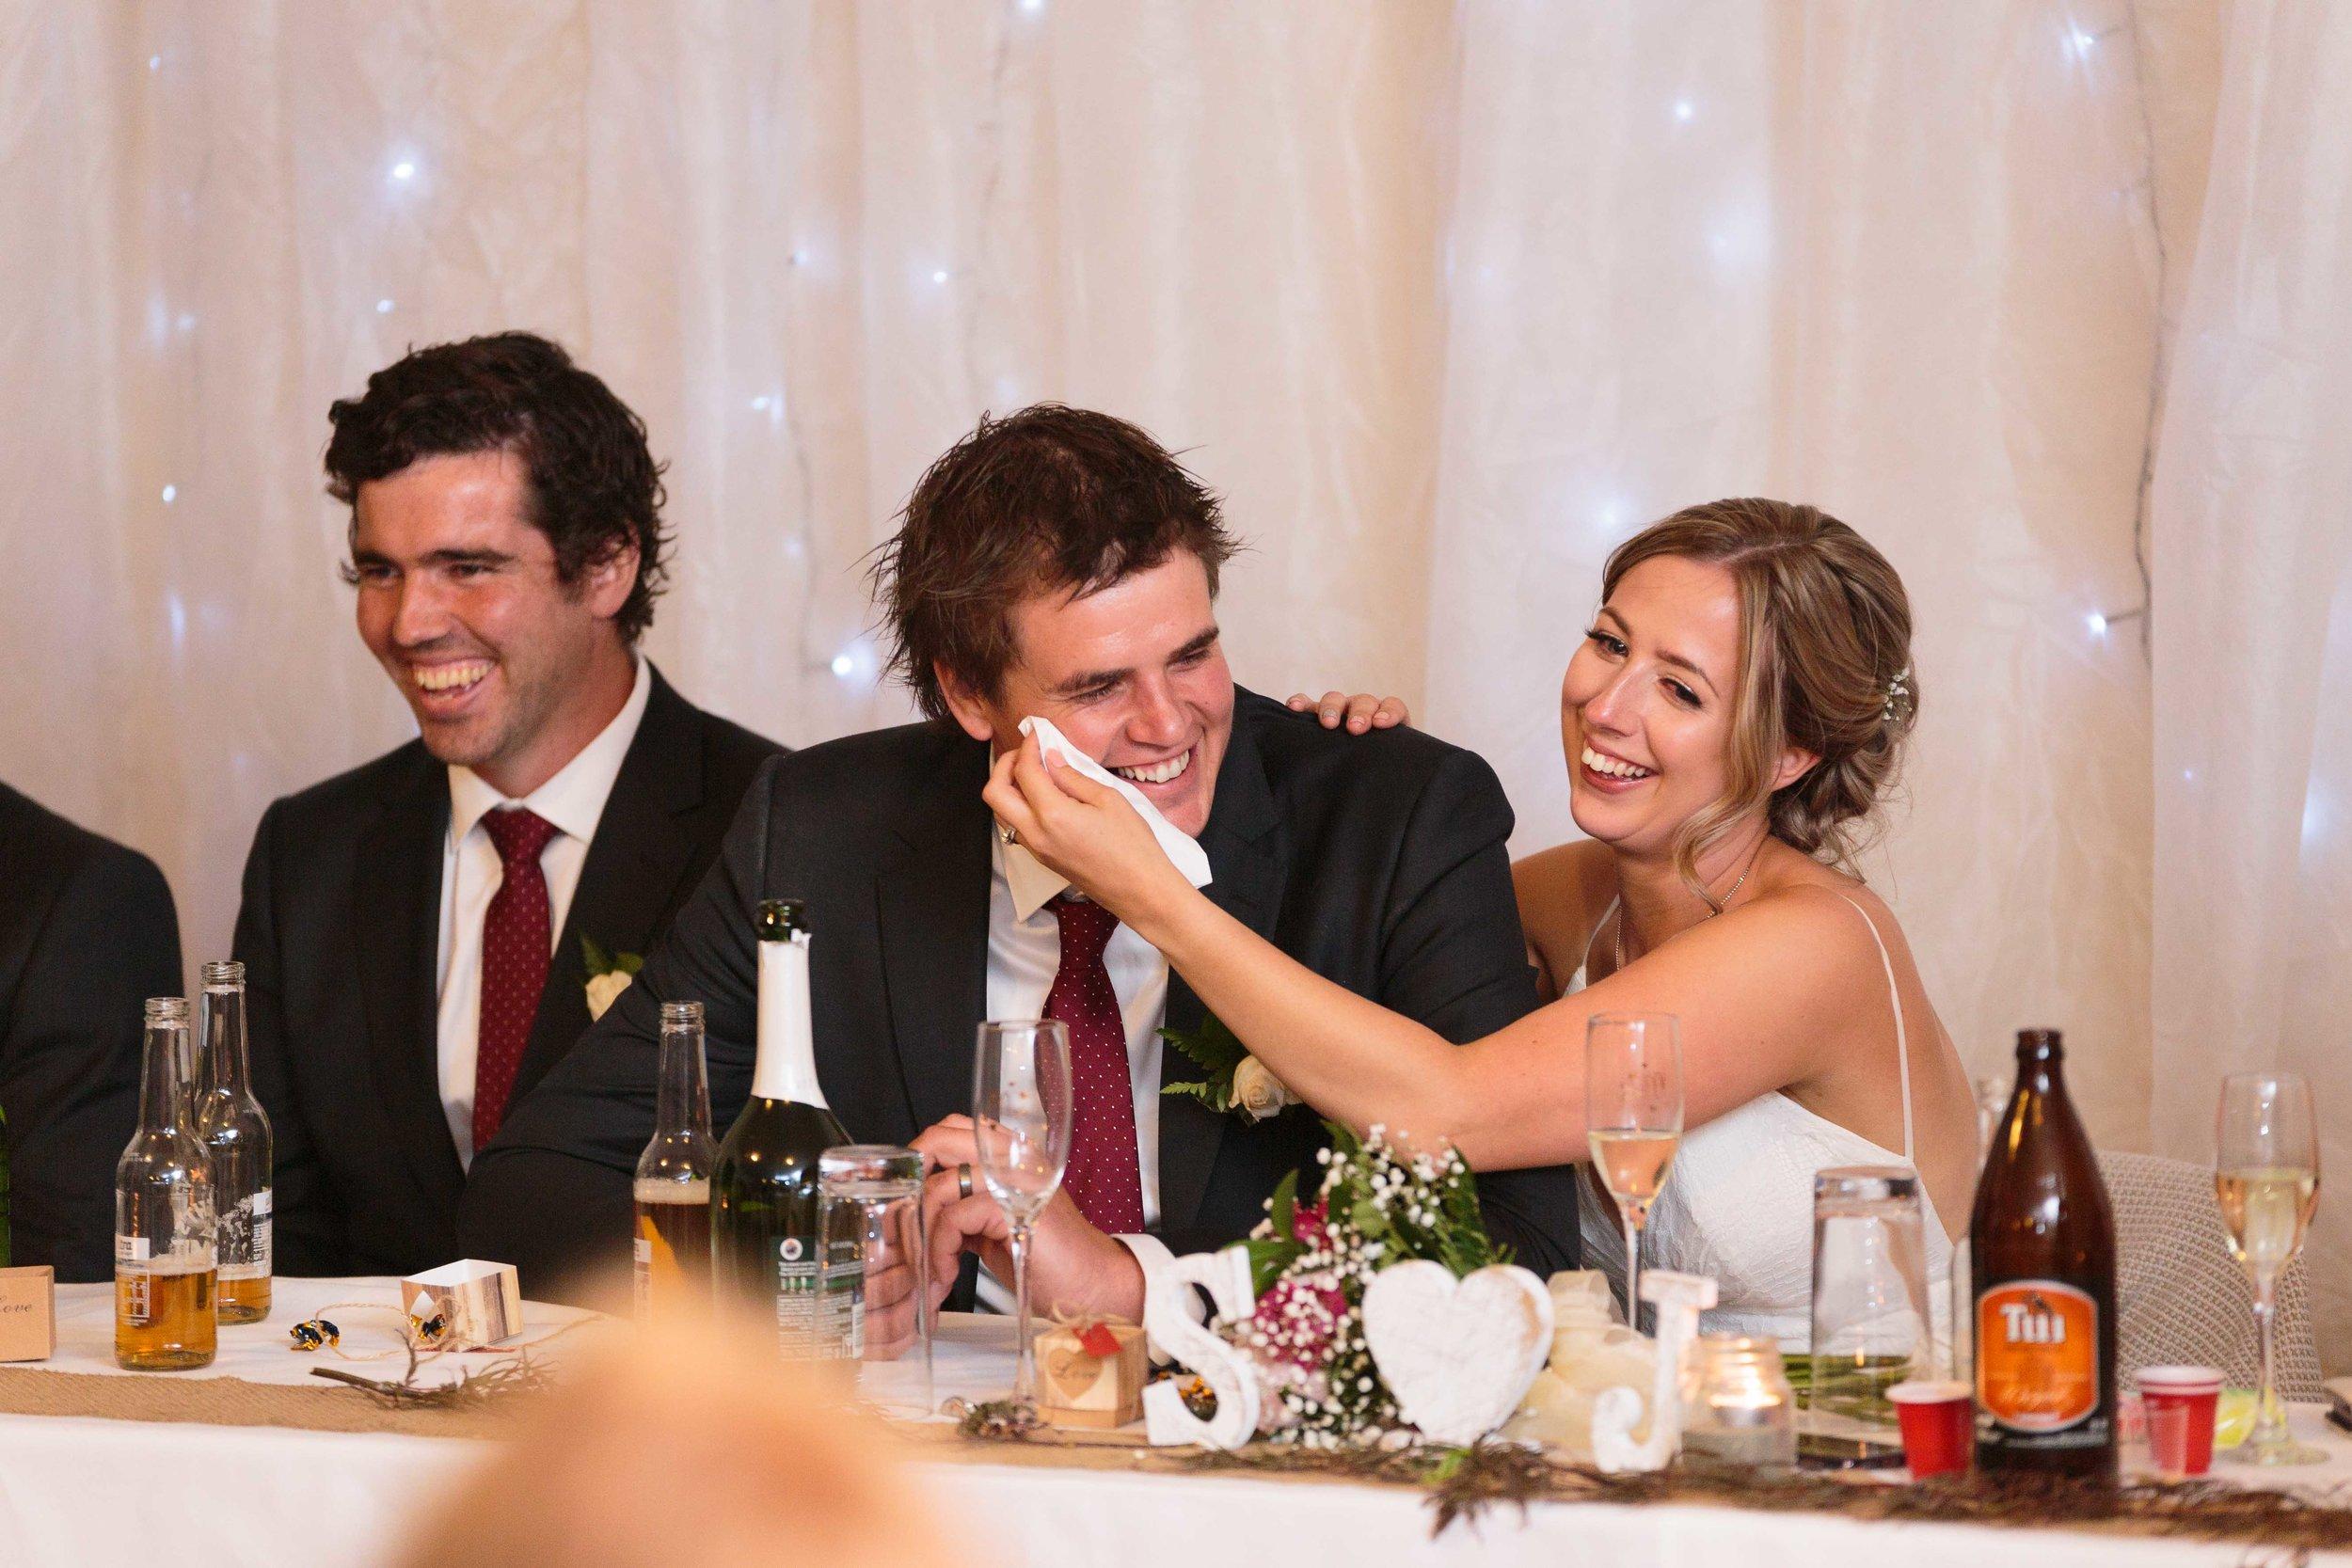 Highight-wedding-photography-dudding-lake-palmerston-north-new-zealand-80.jpg